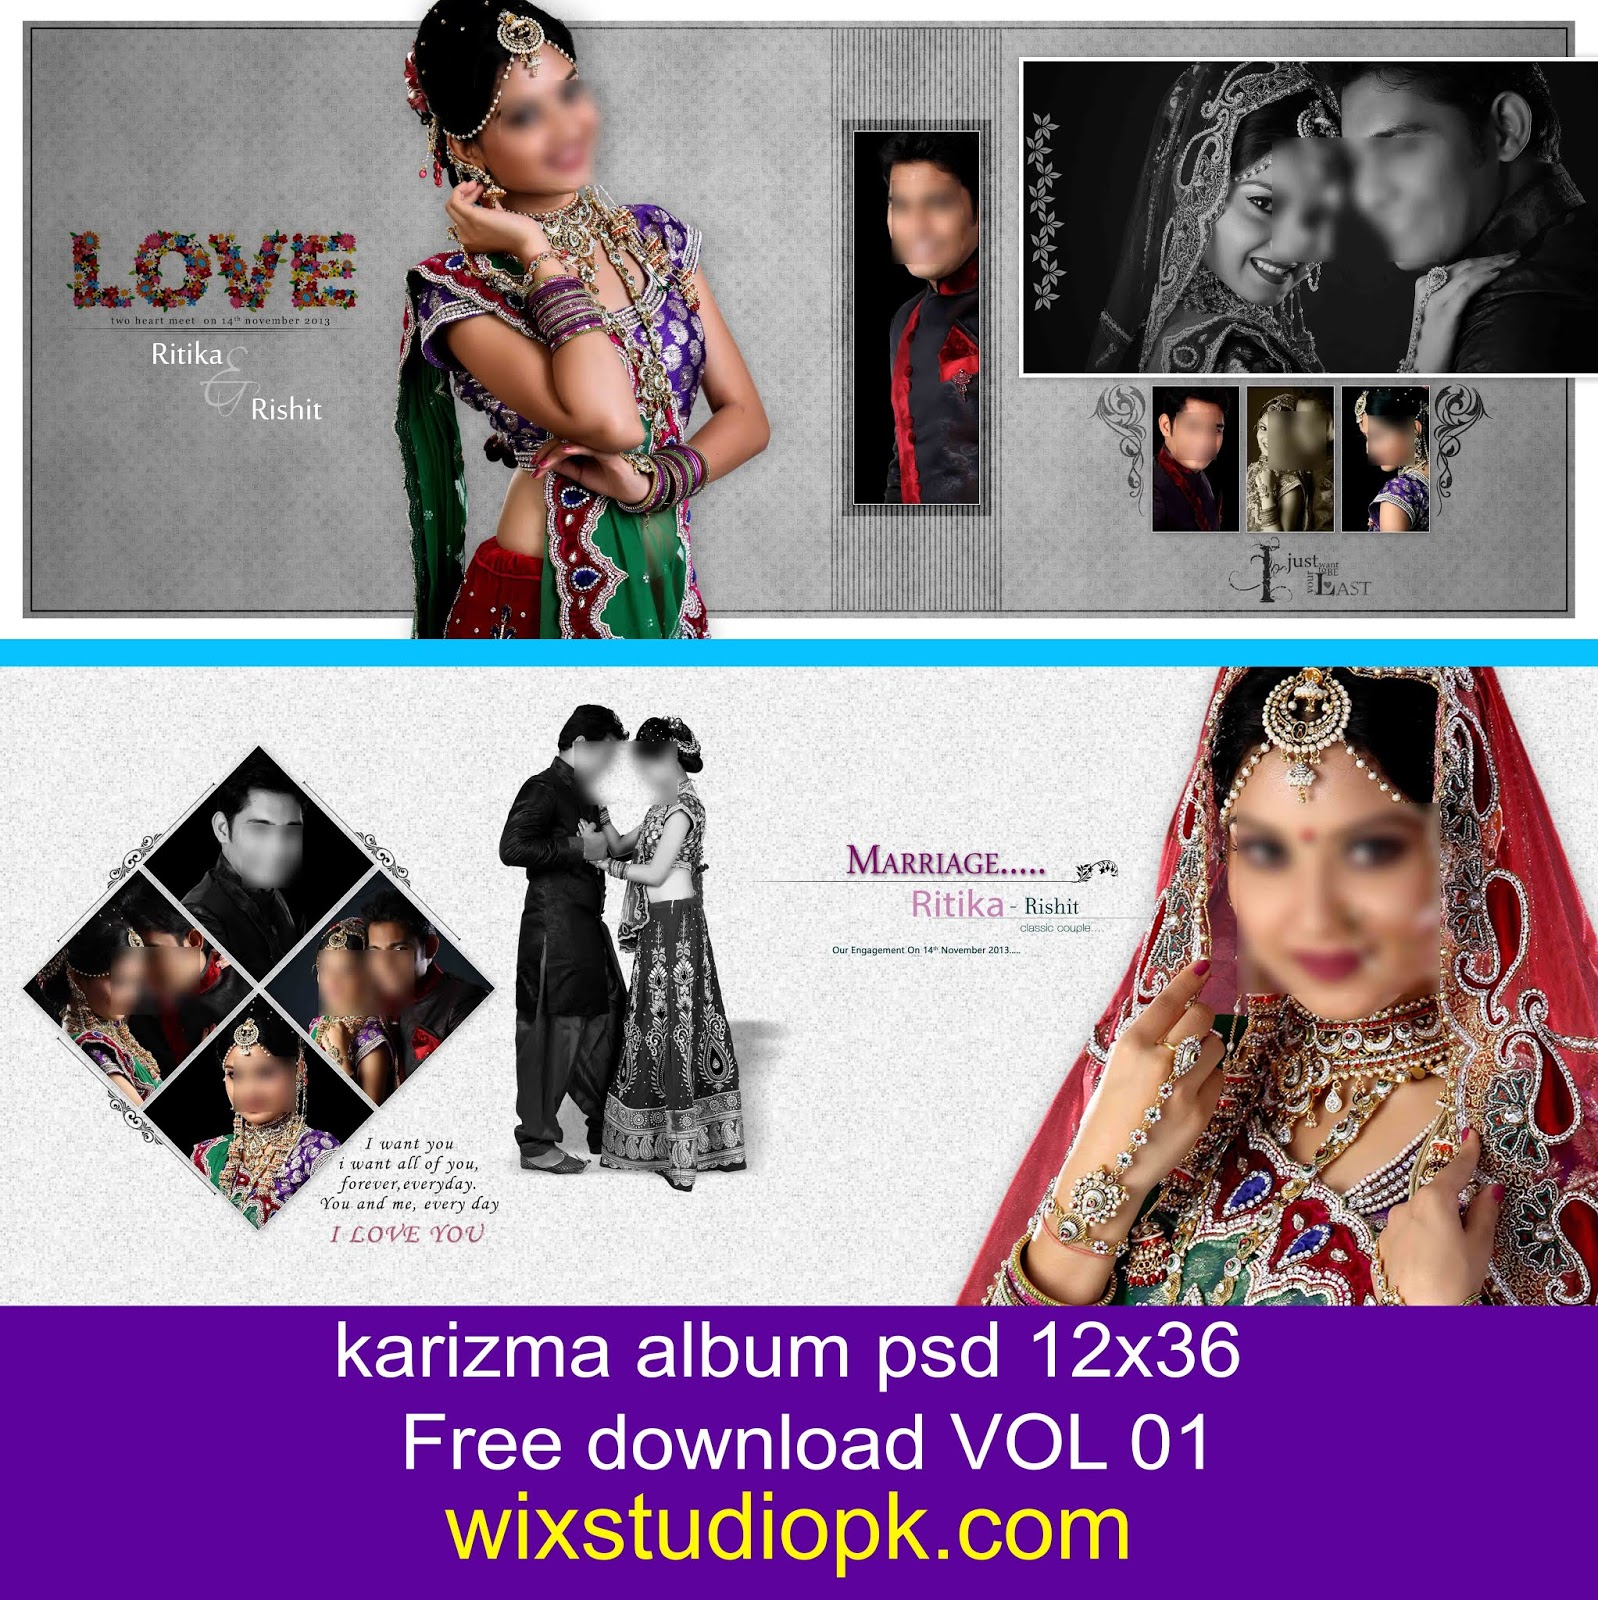 Dx Album Karizma Album Psd 12x36 Free Download Vol 01